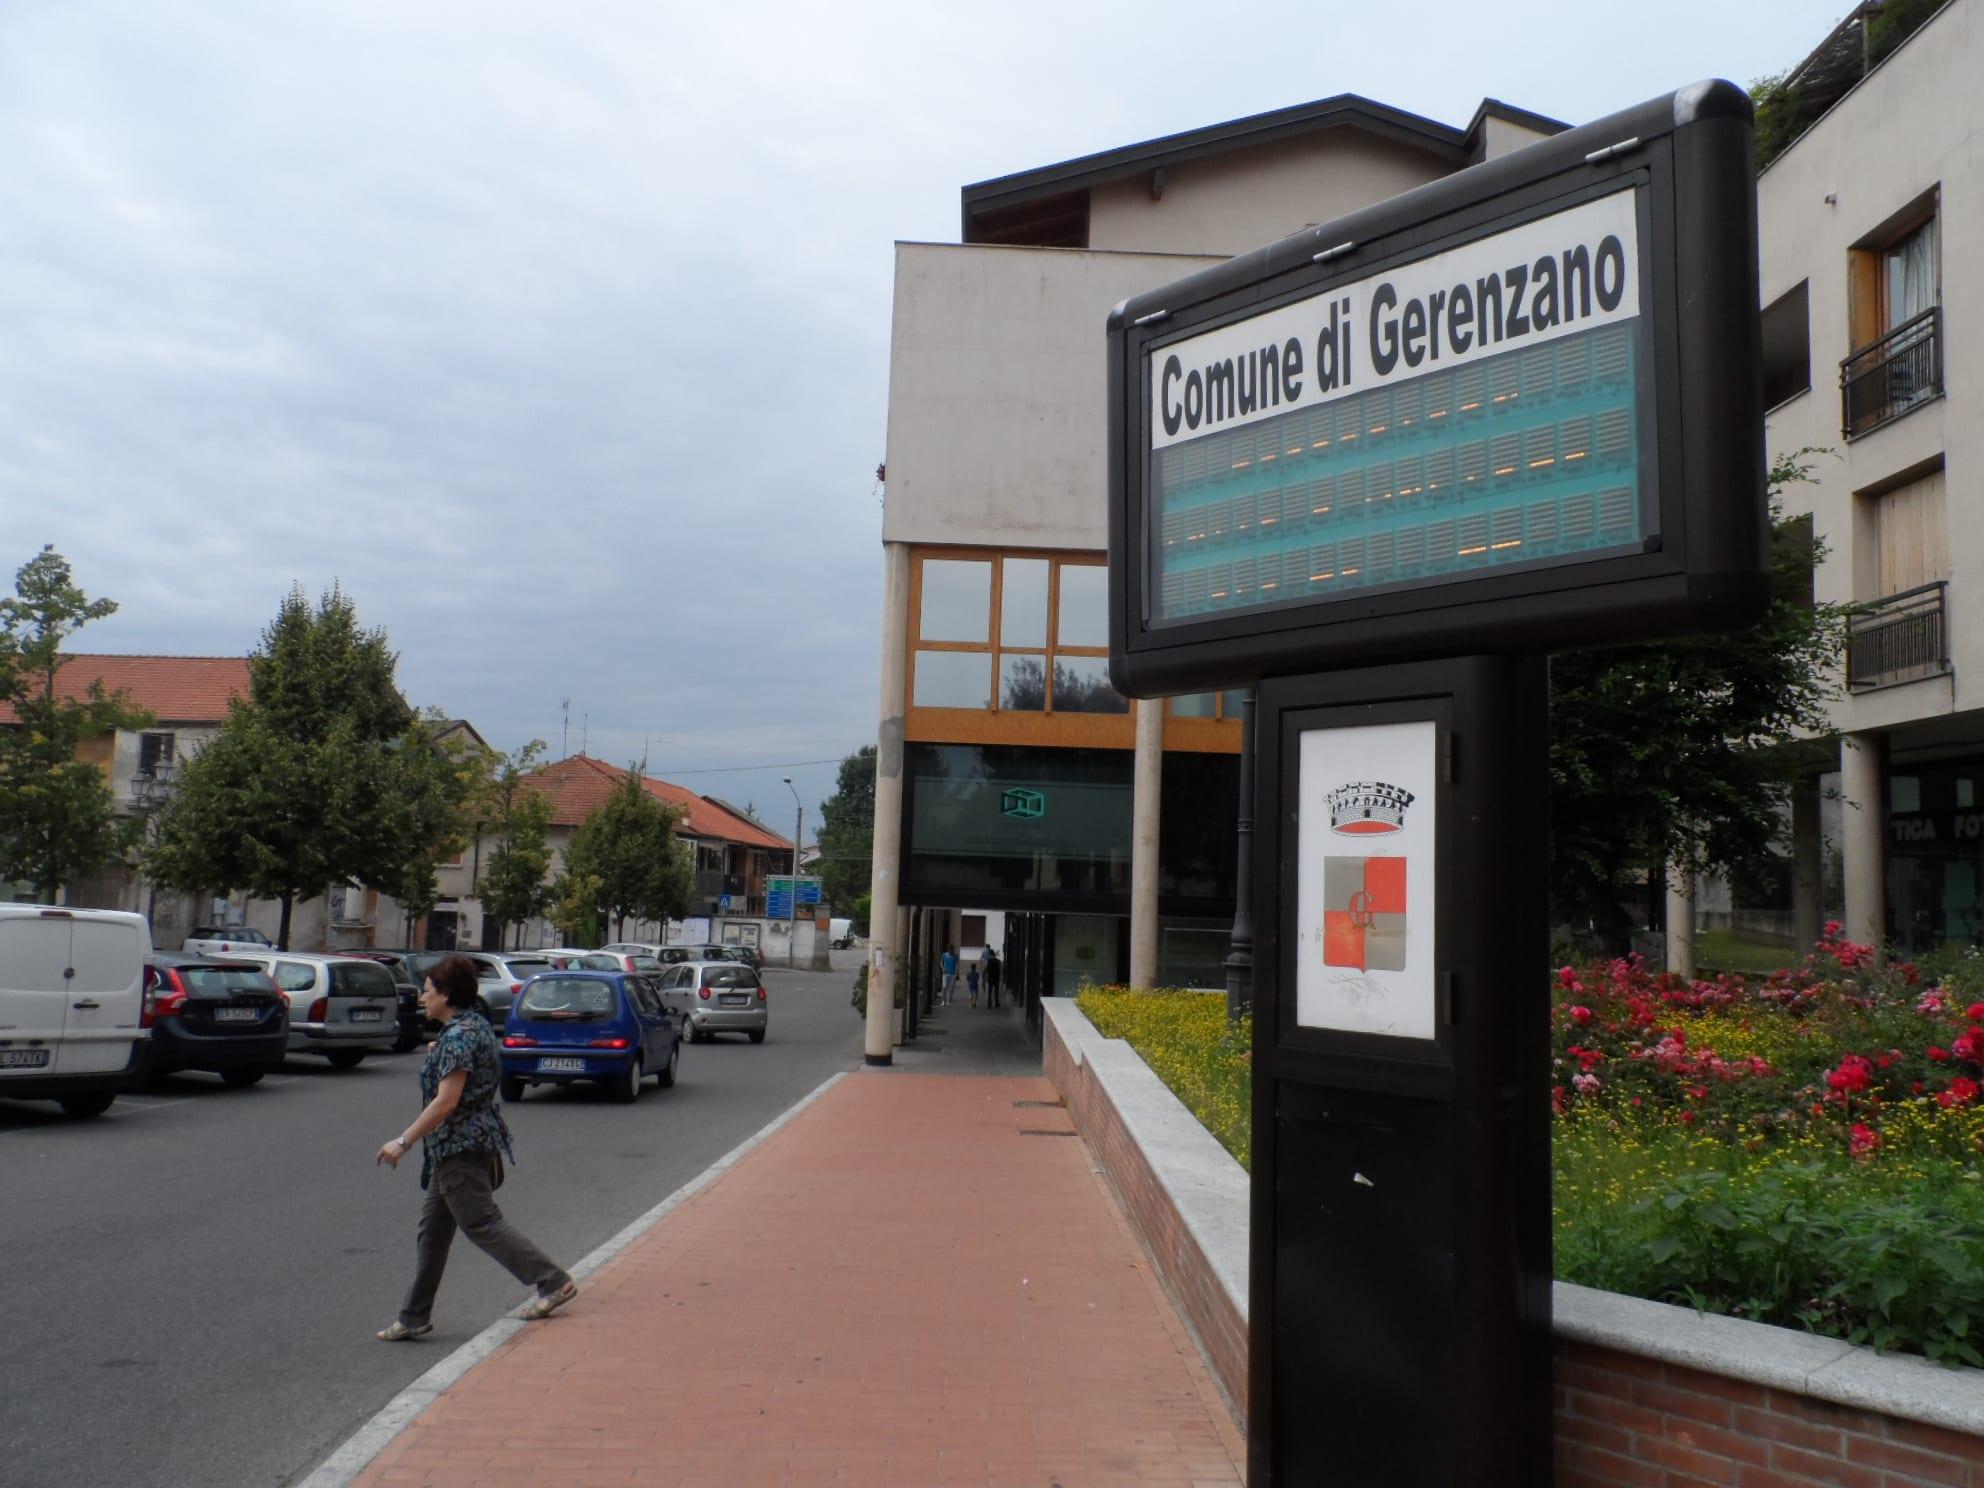 gerenzano centro storico (2)